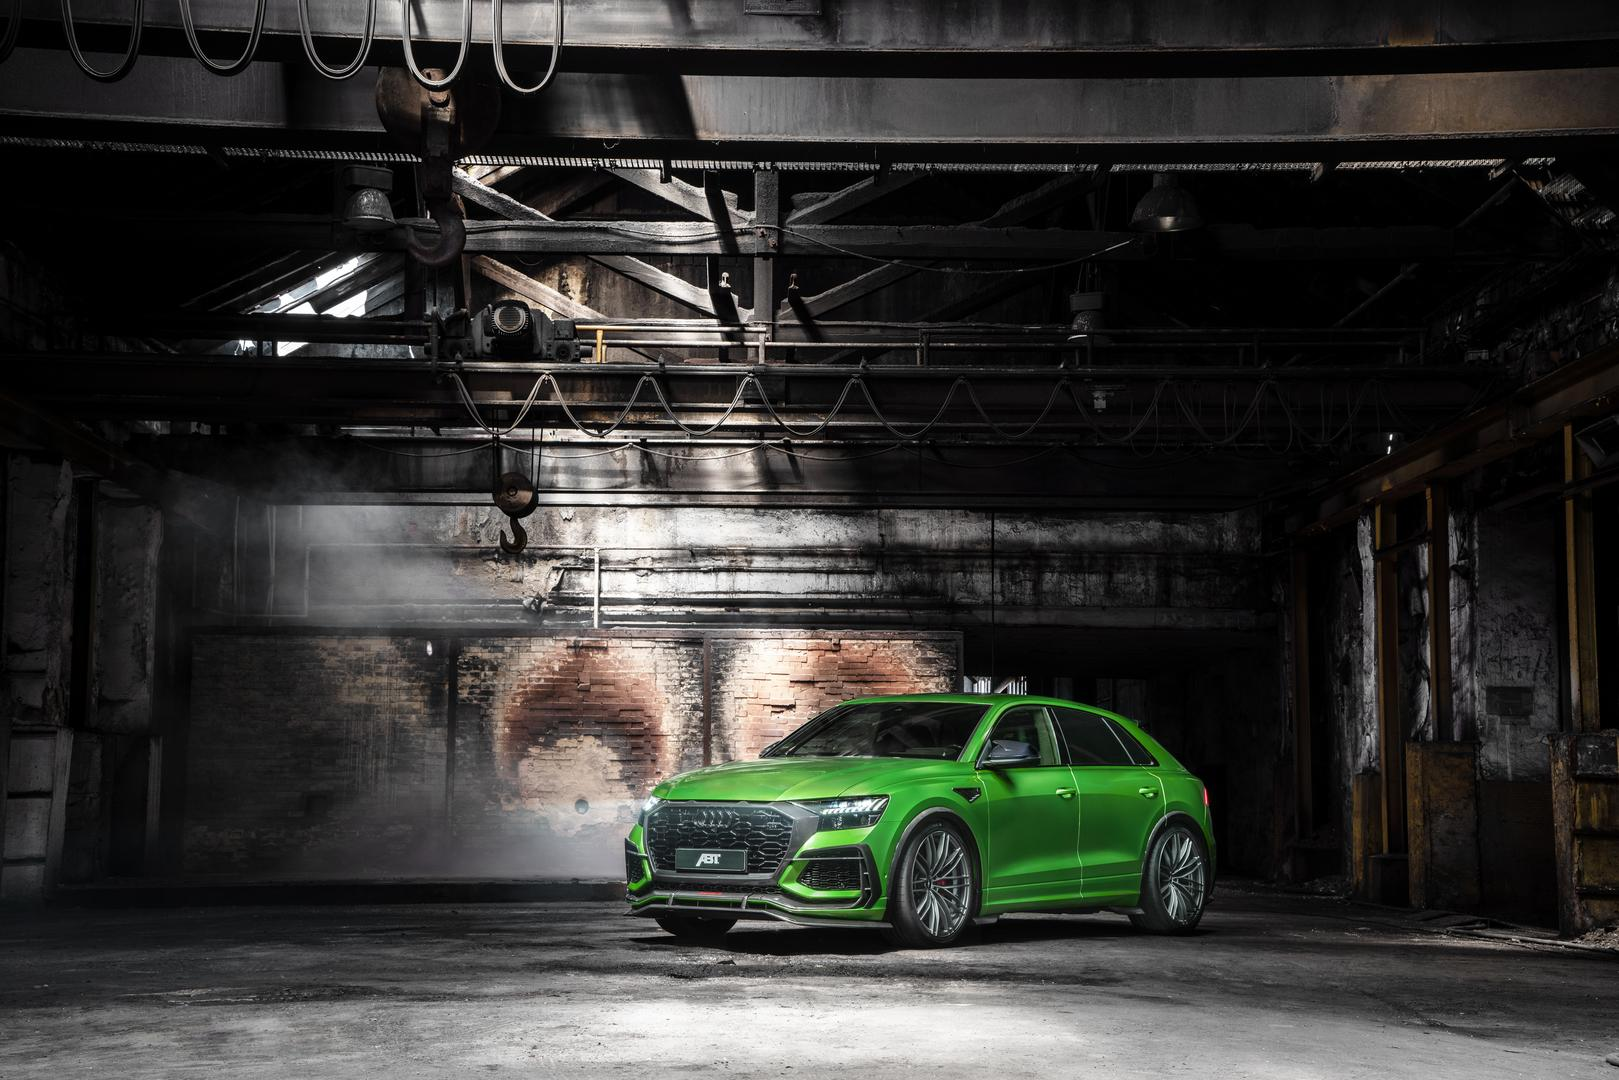 Green ABT Audi RSQ8-R